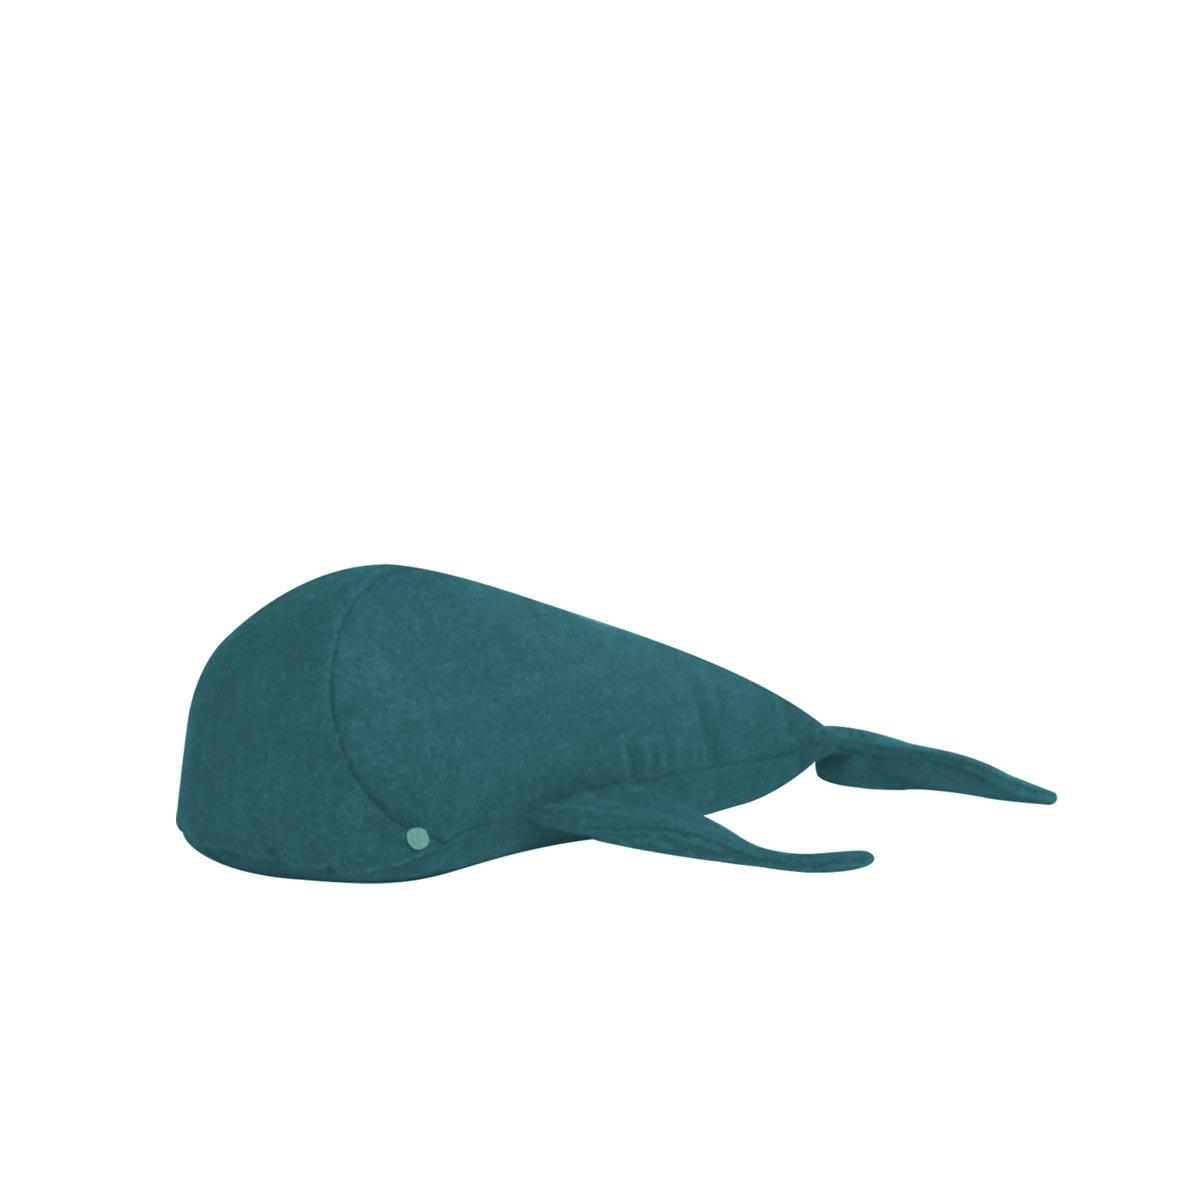 Almofada Baleia Tecido Feltro Petroleo 02